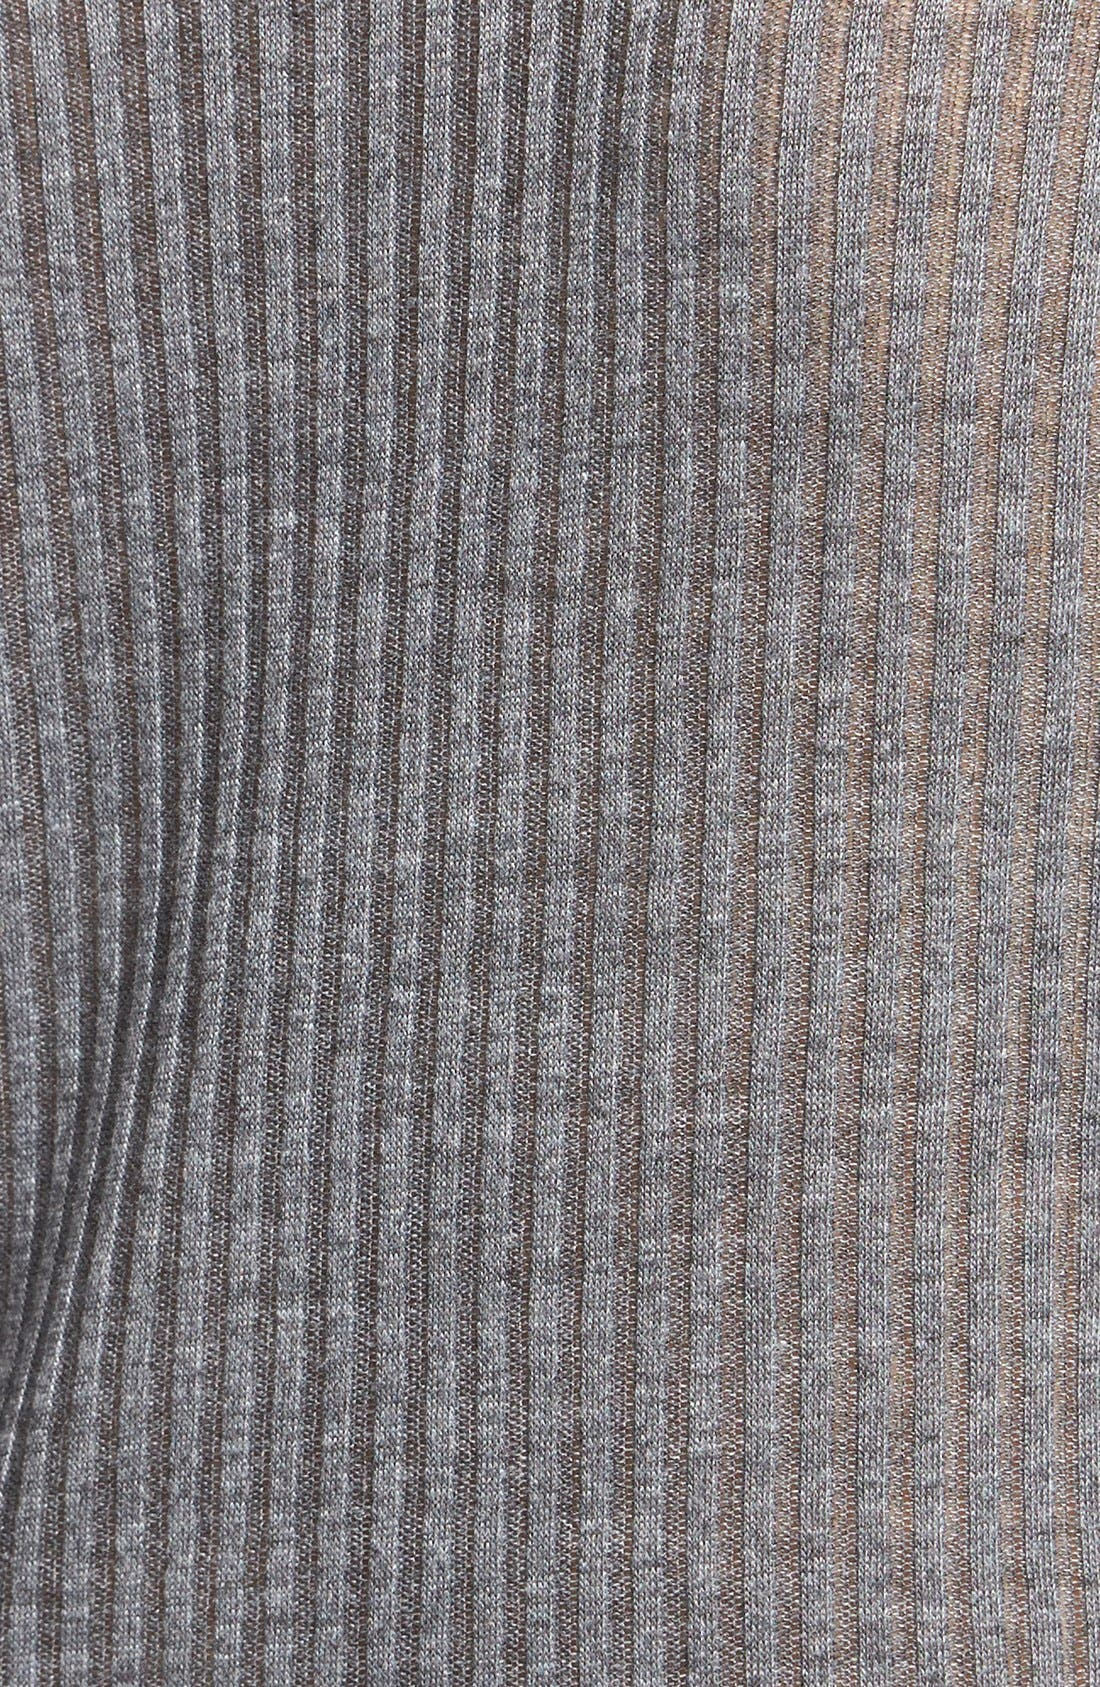 Alternate Image 3  - Topshop Rib Knit Funnel Neck Top